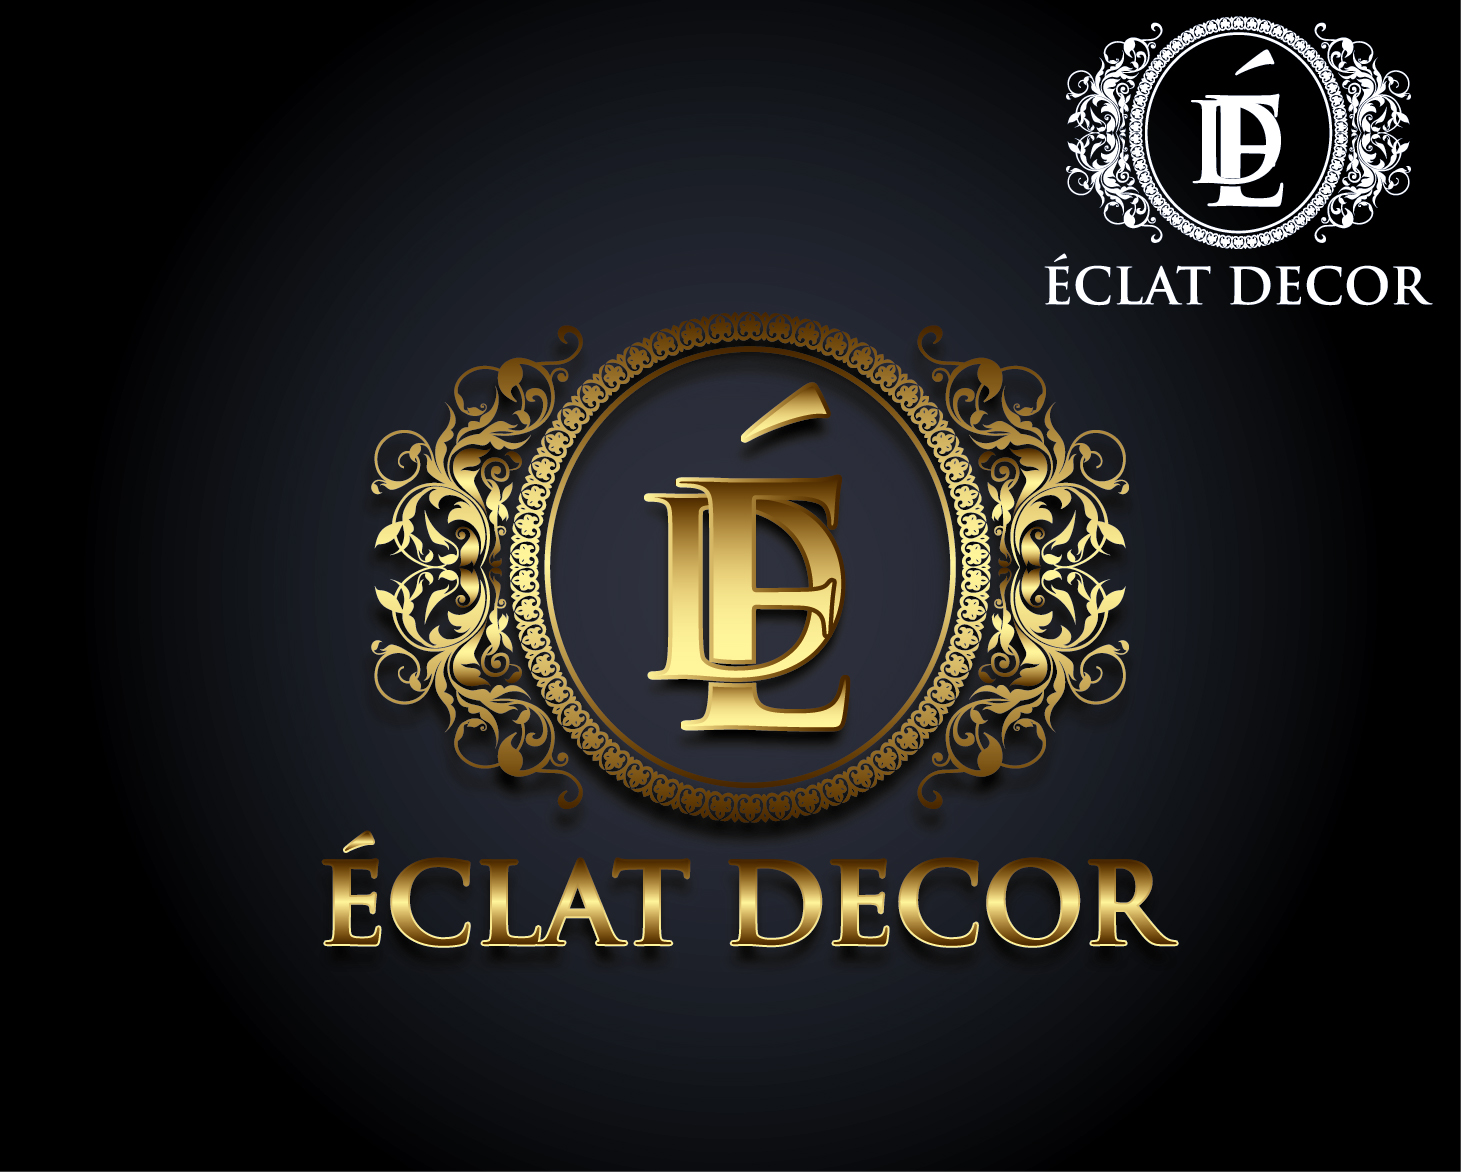 Logo Design by VENTSISLAV KOVACHEV - Entry No. 52 in the Logo Design Contest Imaginative Logo Design for Éclat Decor.